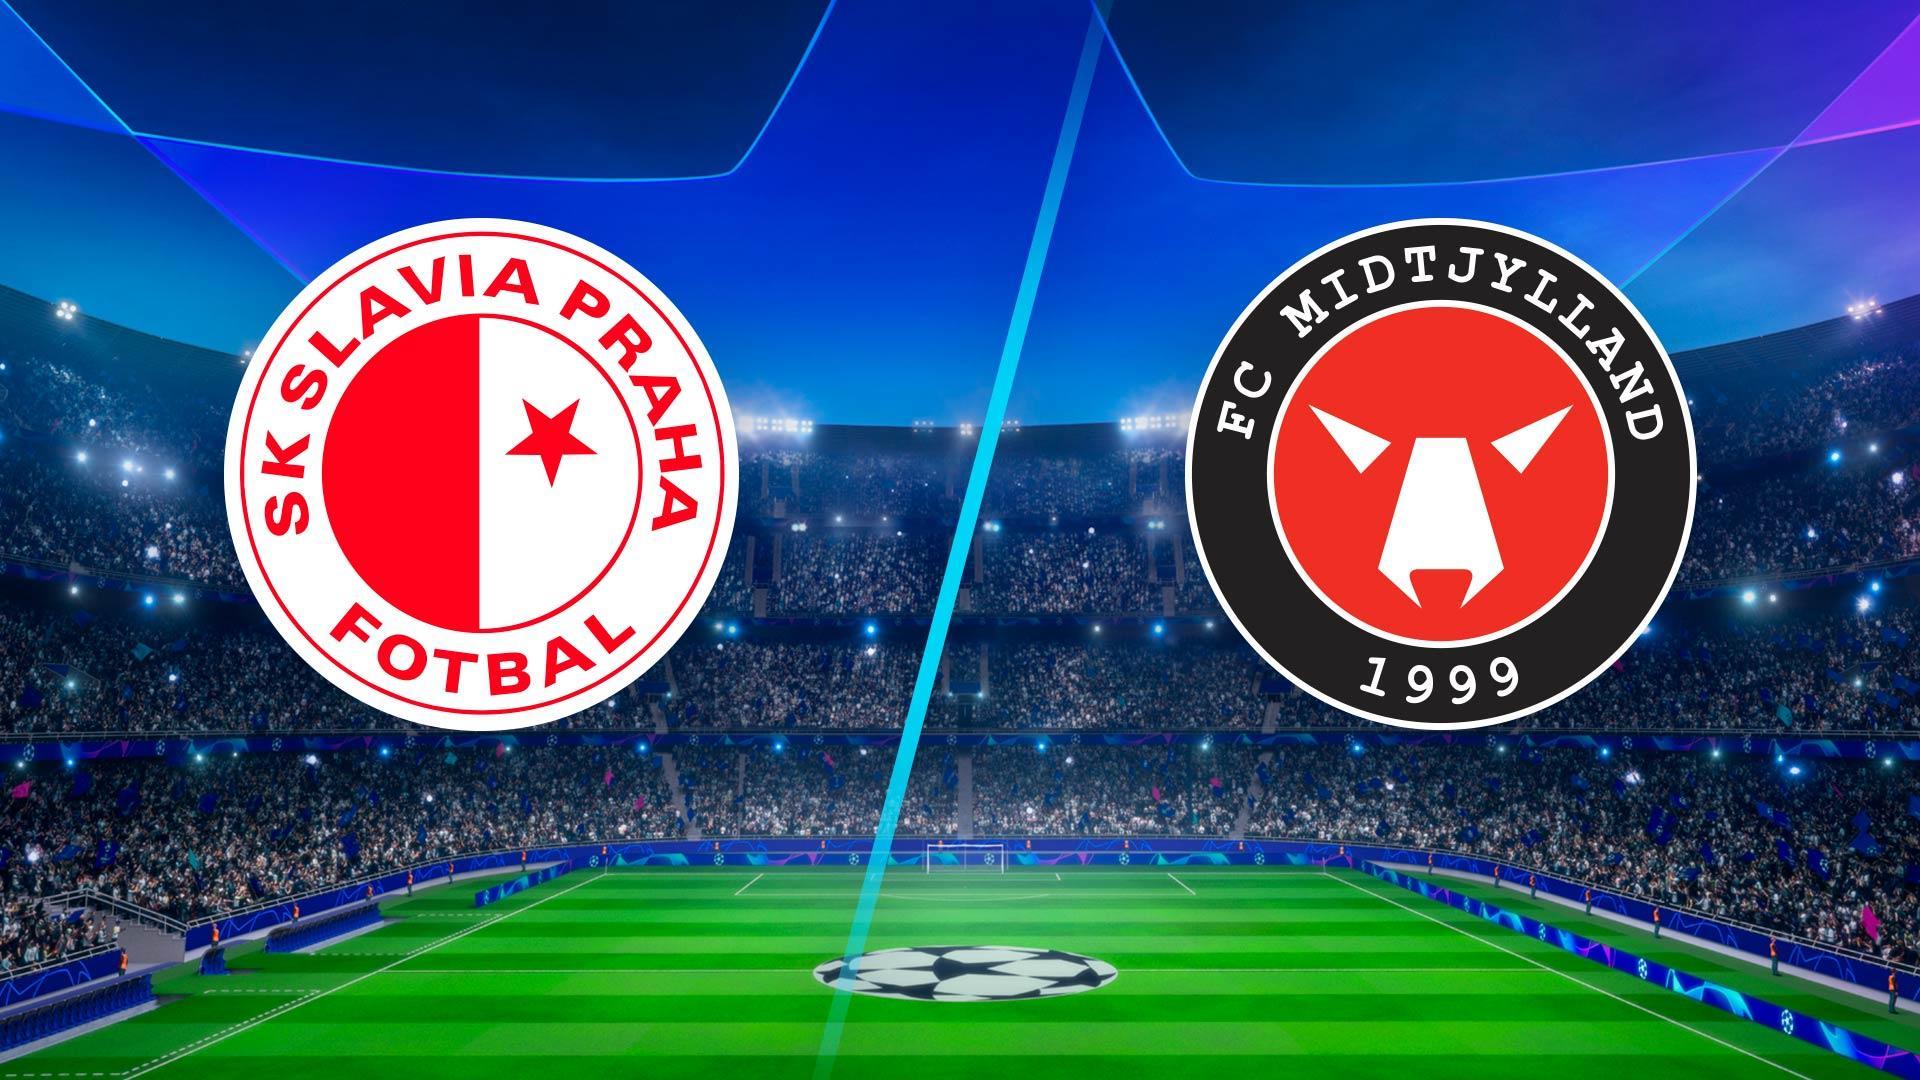 3-ucl-cbssports-thumb-playoff-slavia-midtjylland